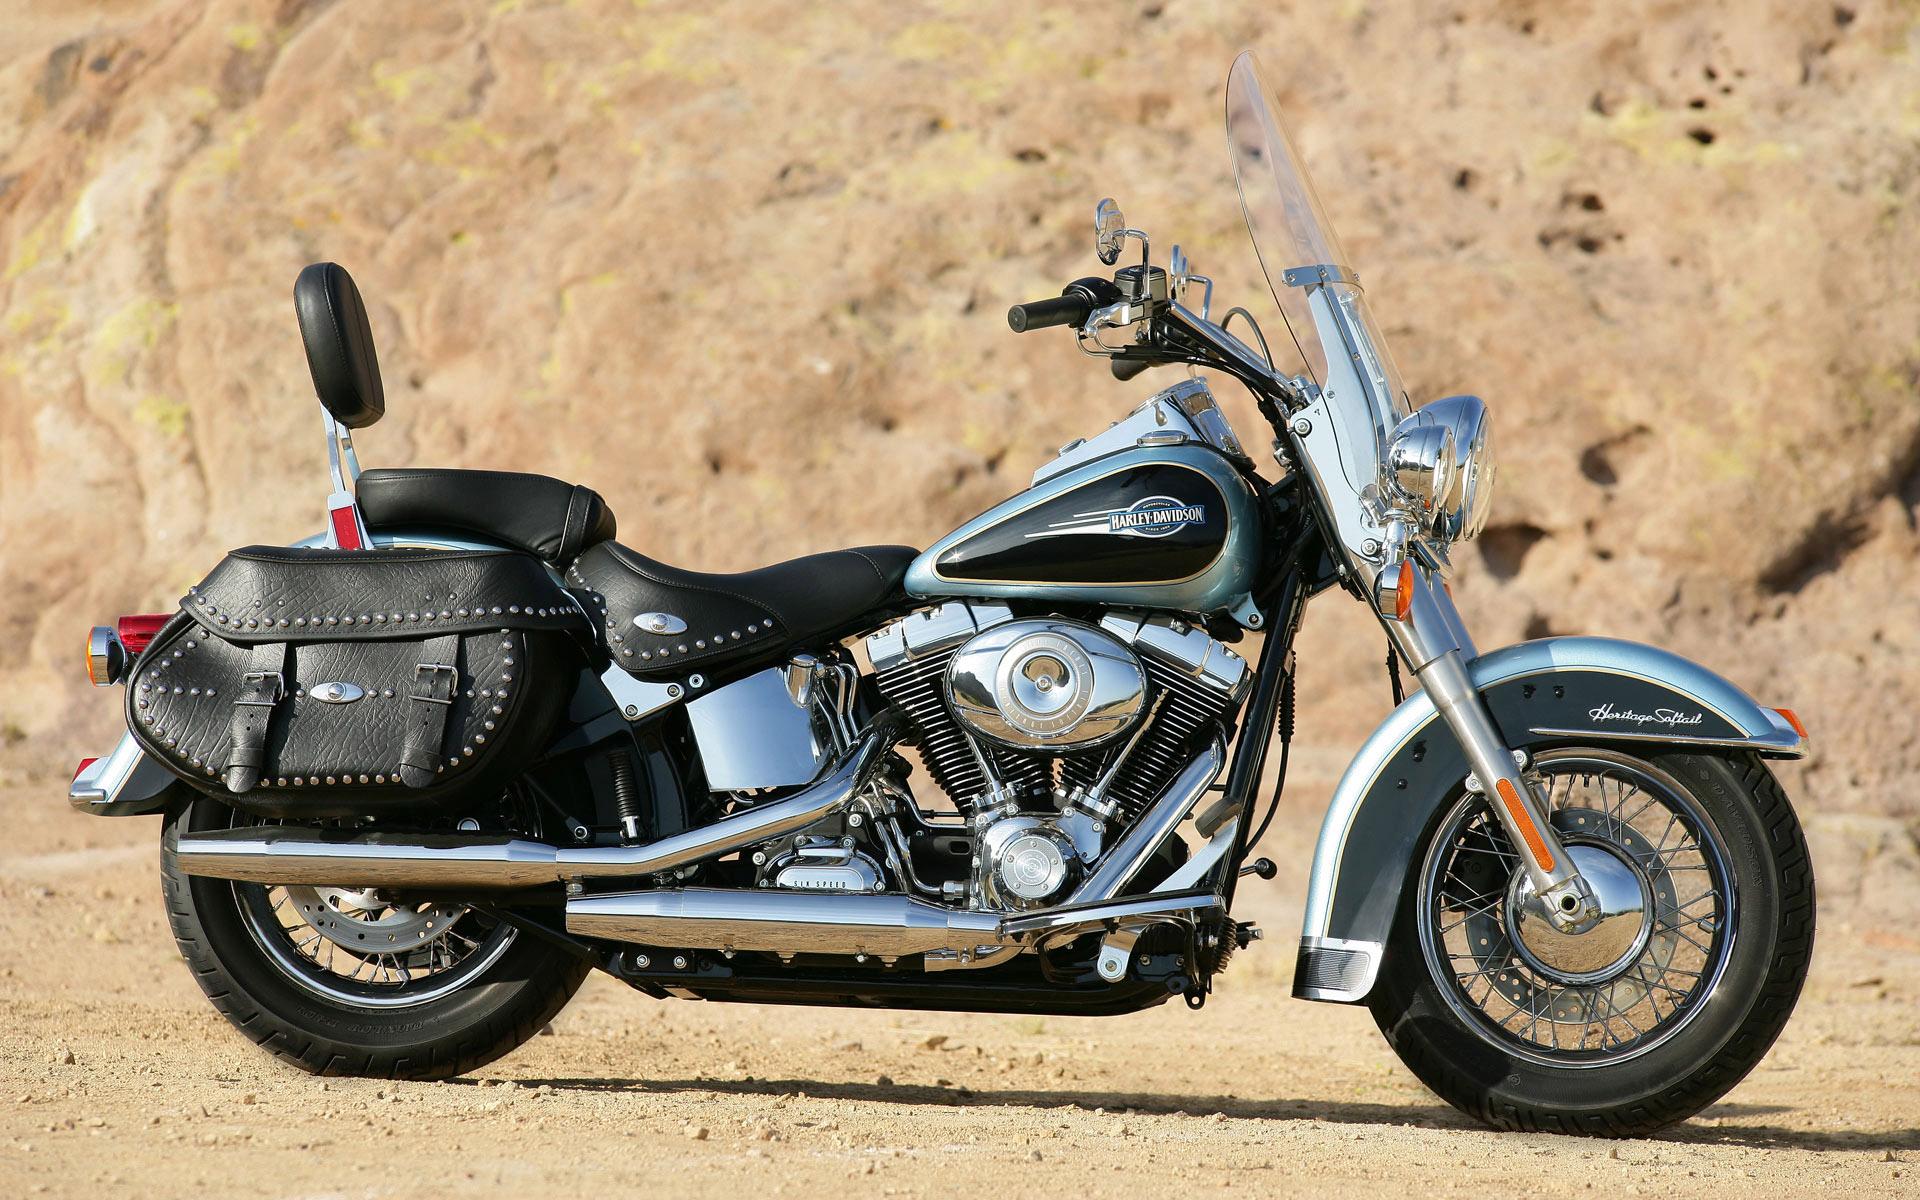 Harley Davidson HD wallpaper 1920 x 1200 pictures 17jpg Harley 32jpg 1920x1200